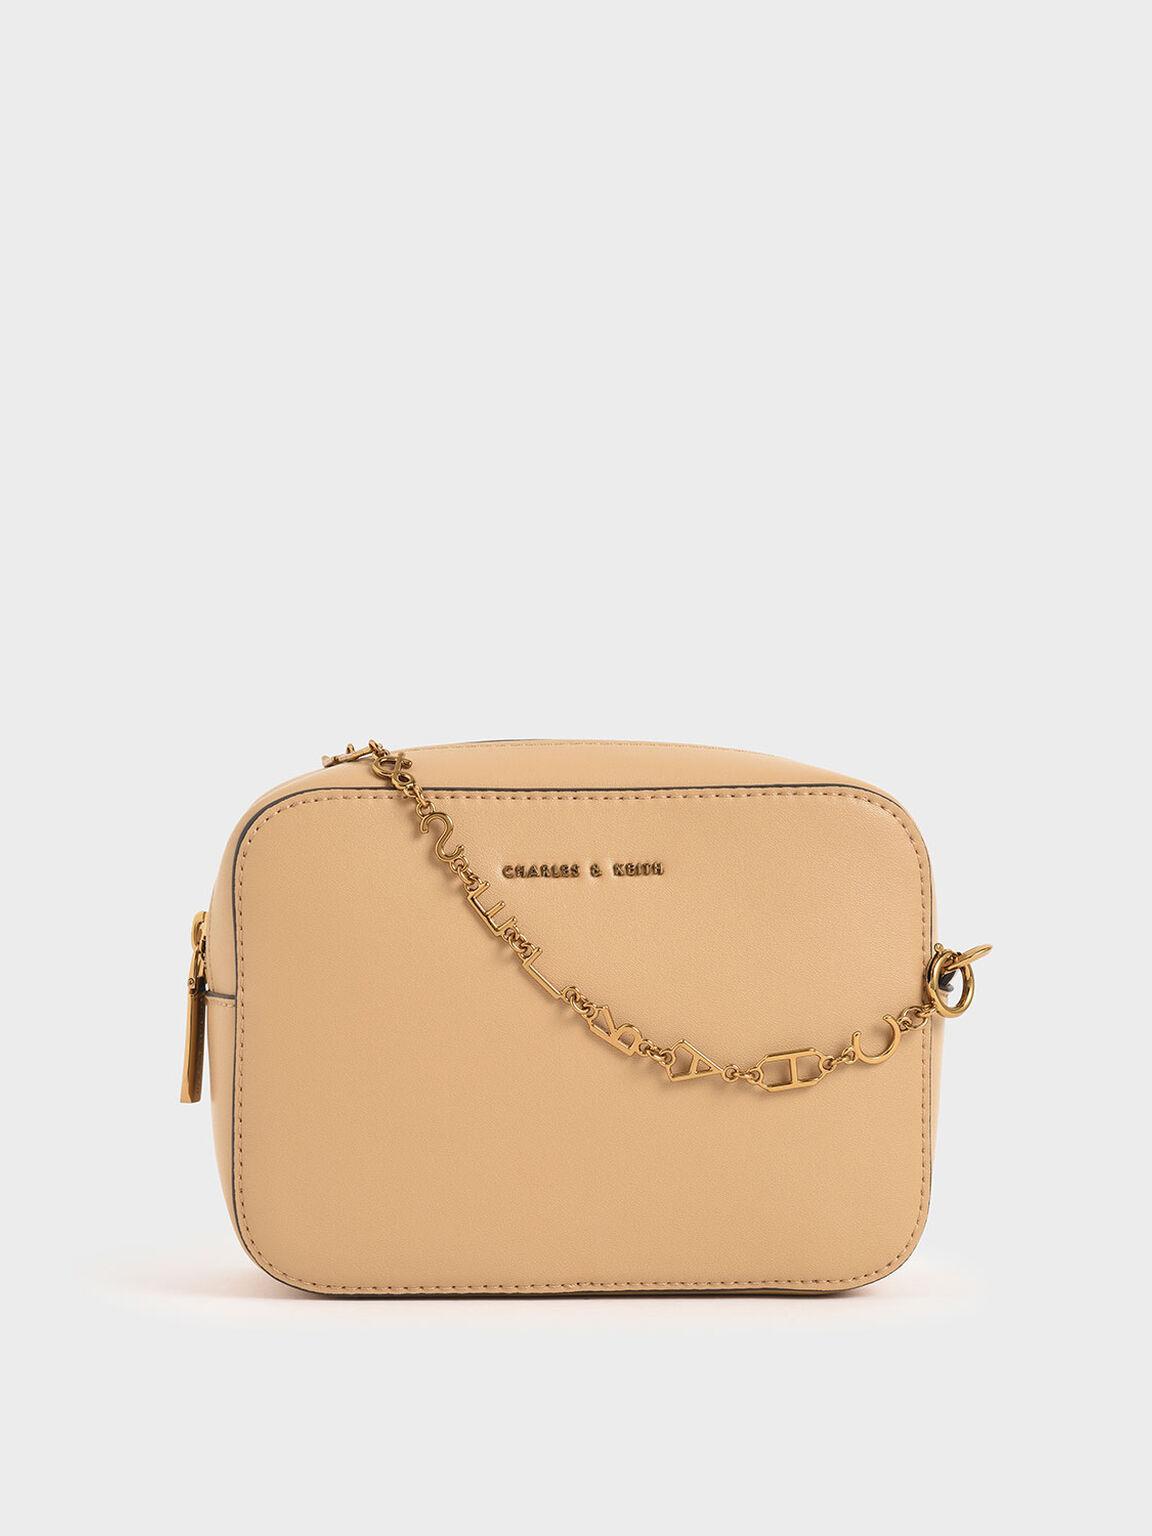 Chain-Link Rectangular Bag, Beige, hi-res